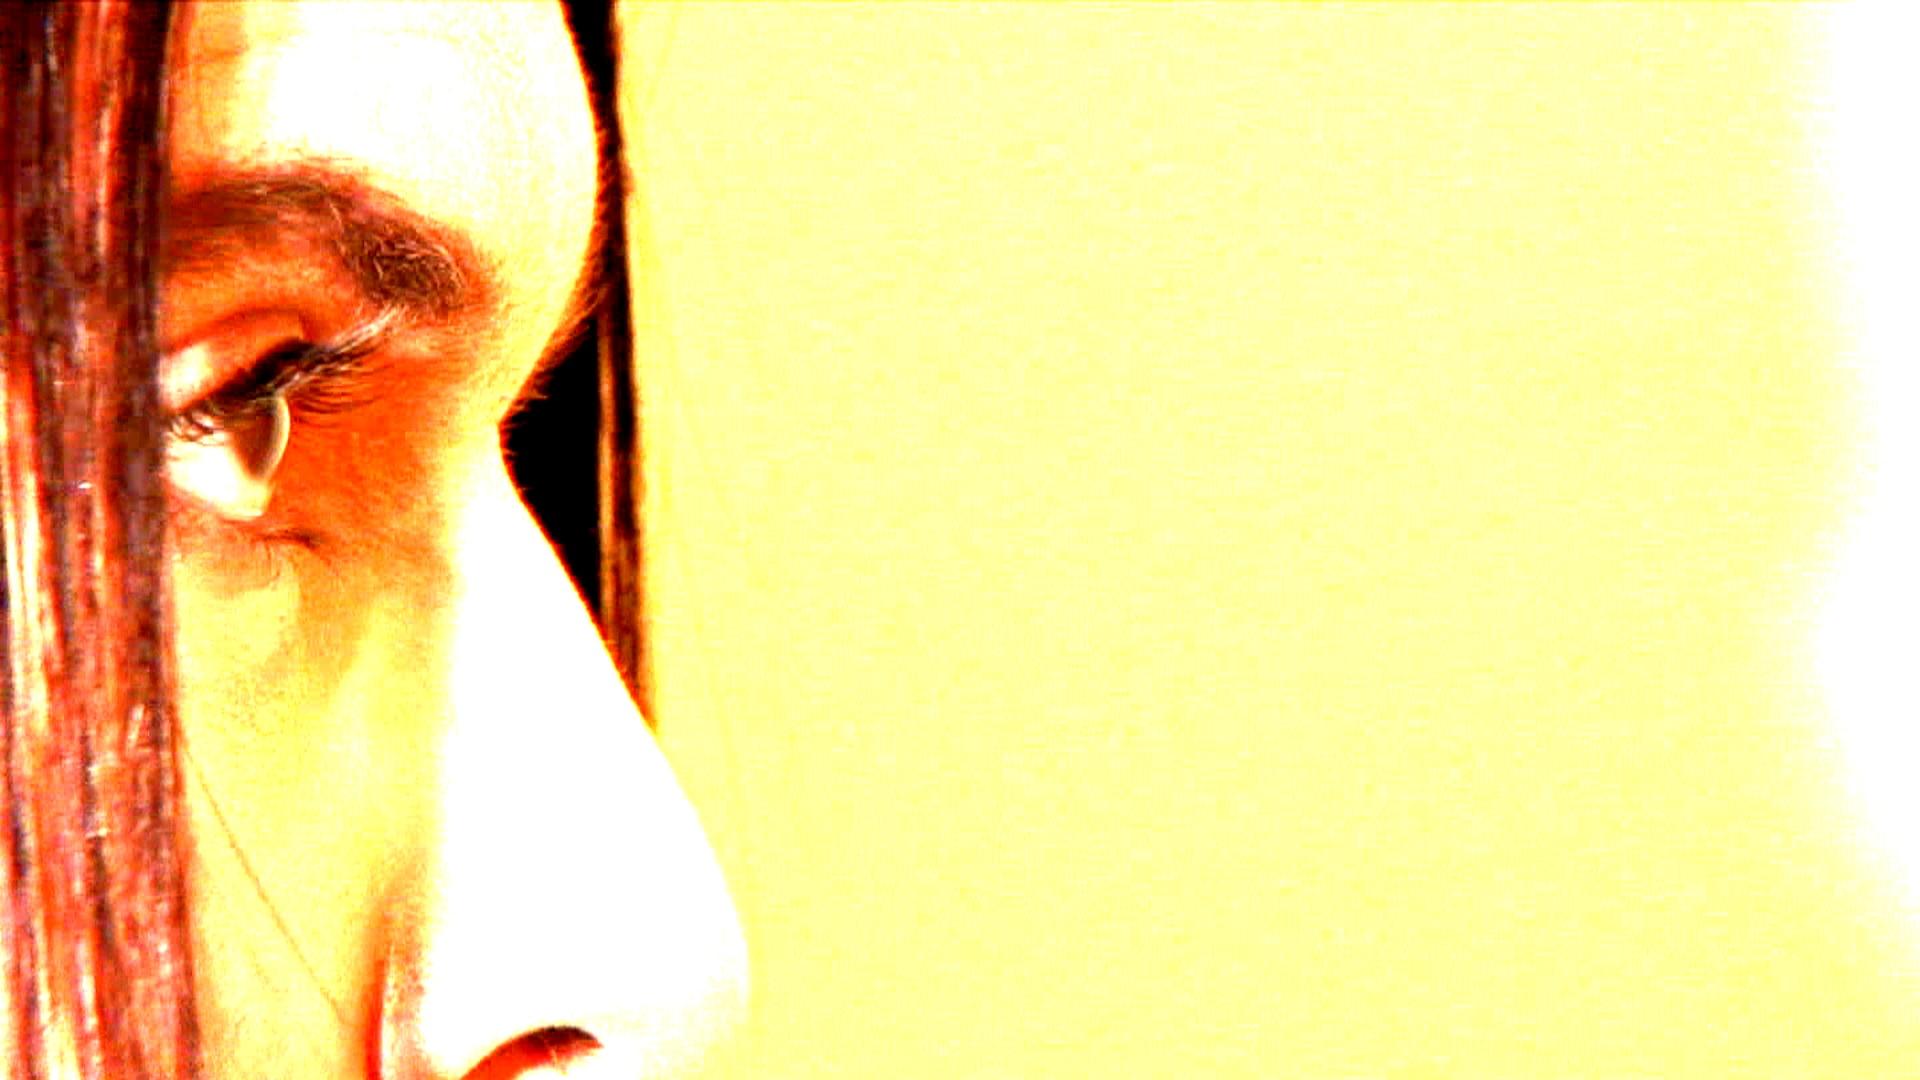 Rohan Quine, 'The Imagination Thief' - film 'JAYMI 115', still 31